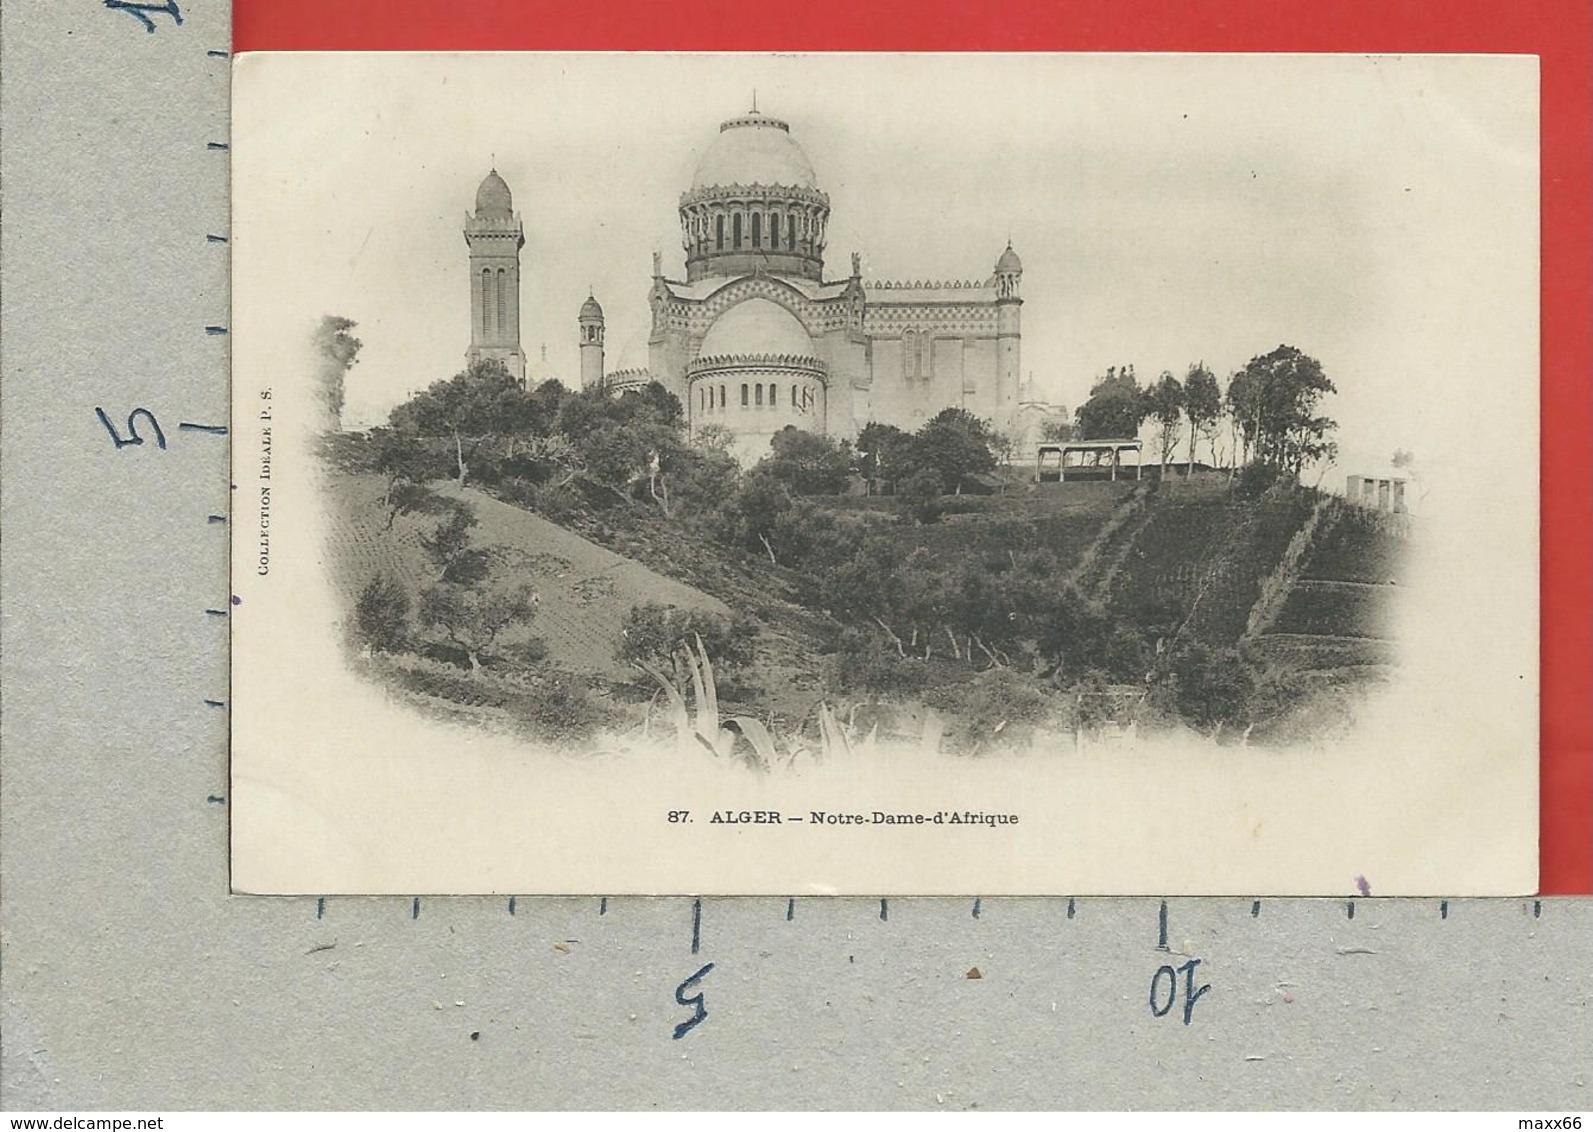 CARTOLINA VG ALGERIA - ALGERI - Notre Dame D'Afrique - Collection Ideale - 9 X 14 - 1904 PER LA FRANCIA - Algeri